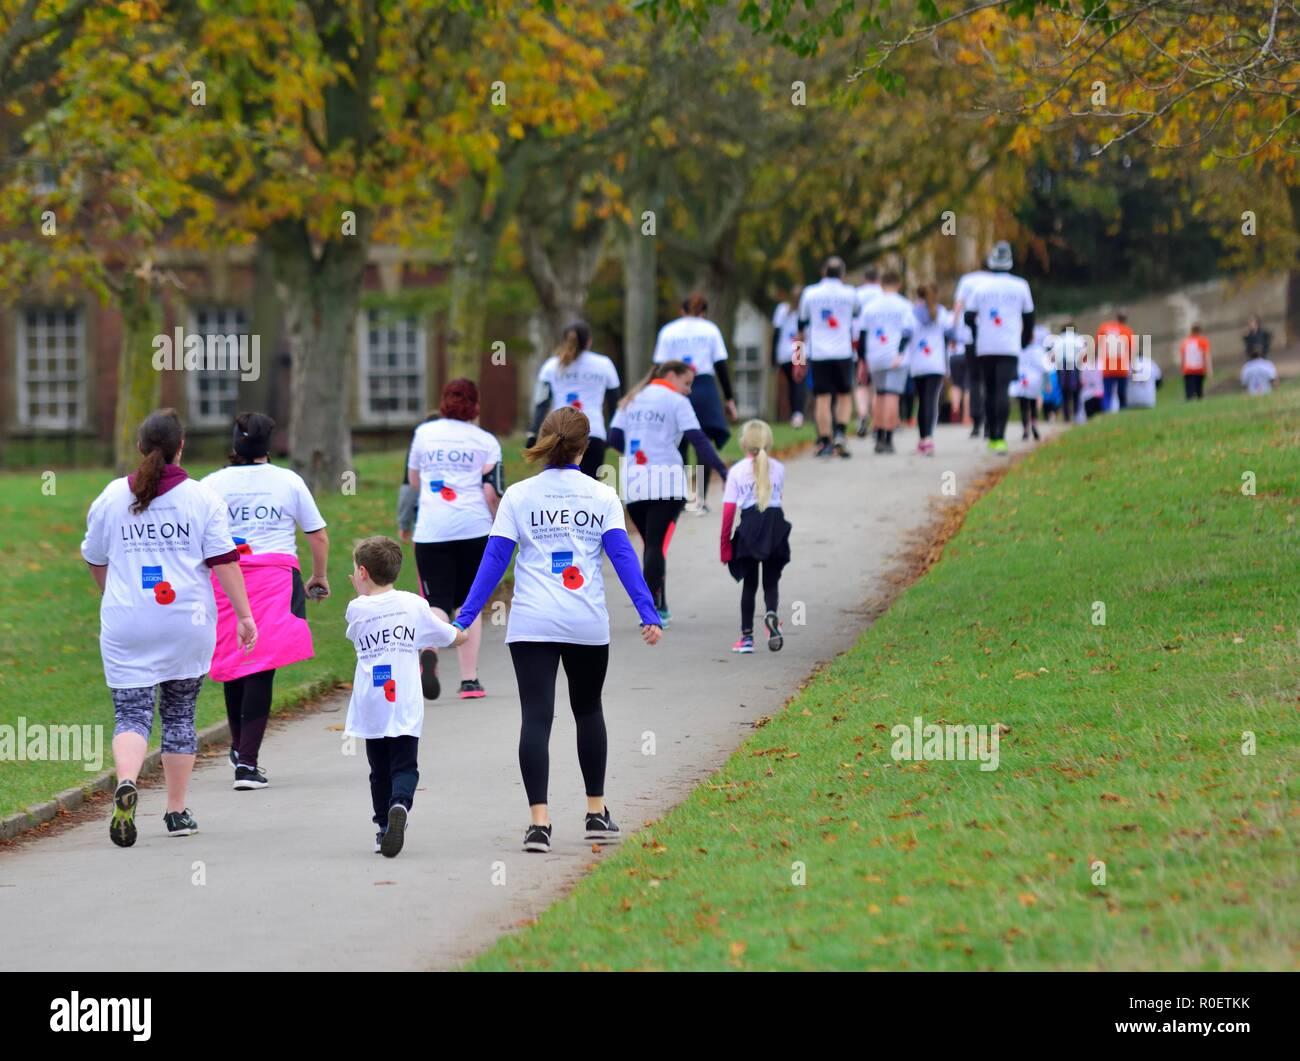 Nottingham, UK. 4th November 2018. The Royal British Legion Poppy Run on Wollaton Park,Nottingham,England,UK. Credit: ACORN 1/Alamy Live News. - Stock Image